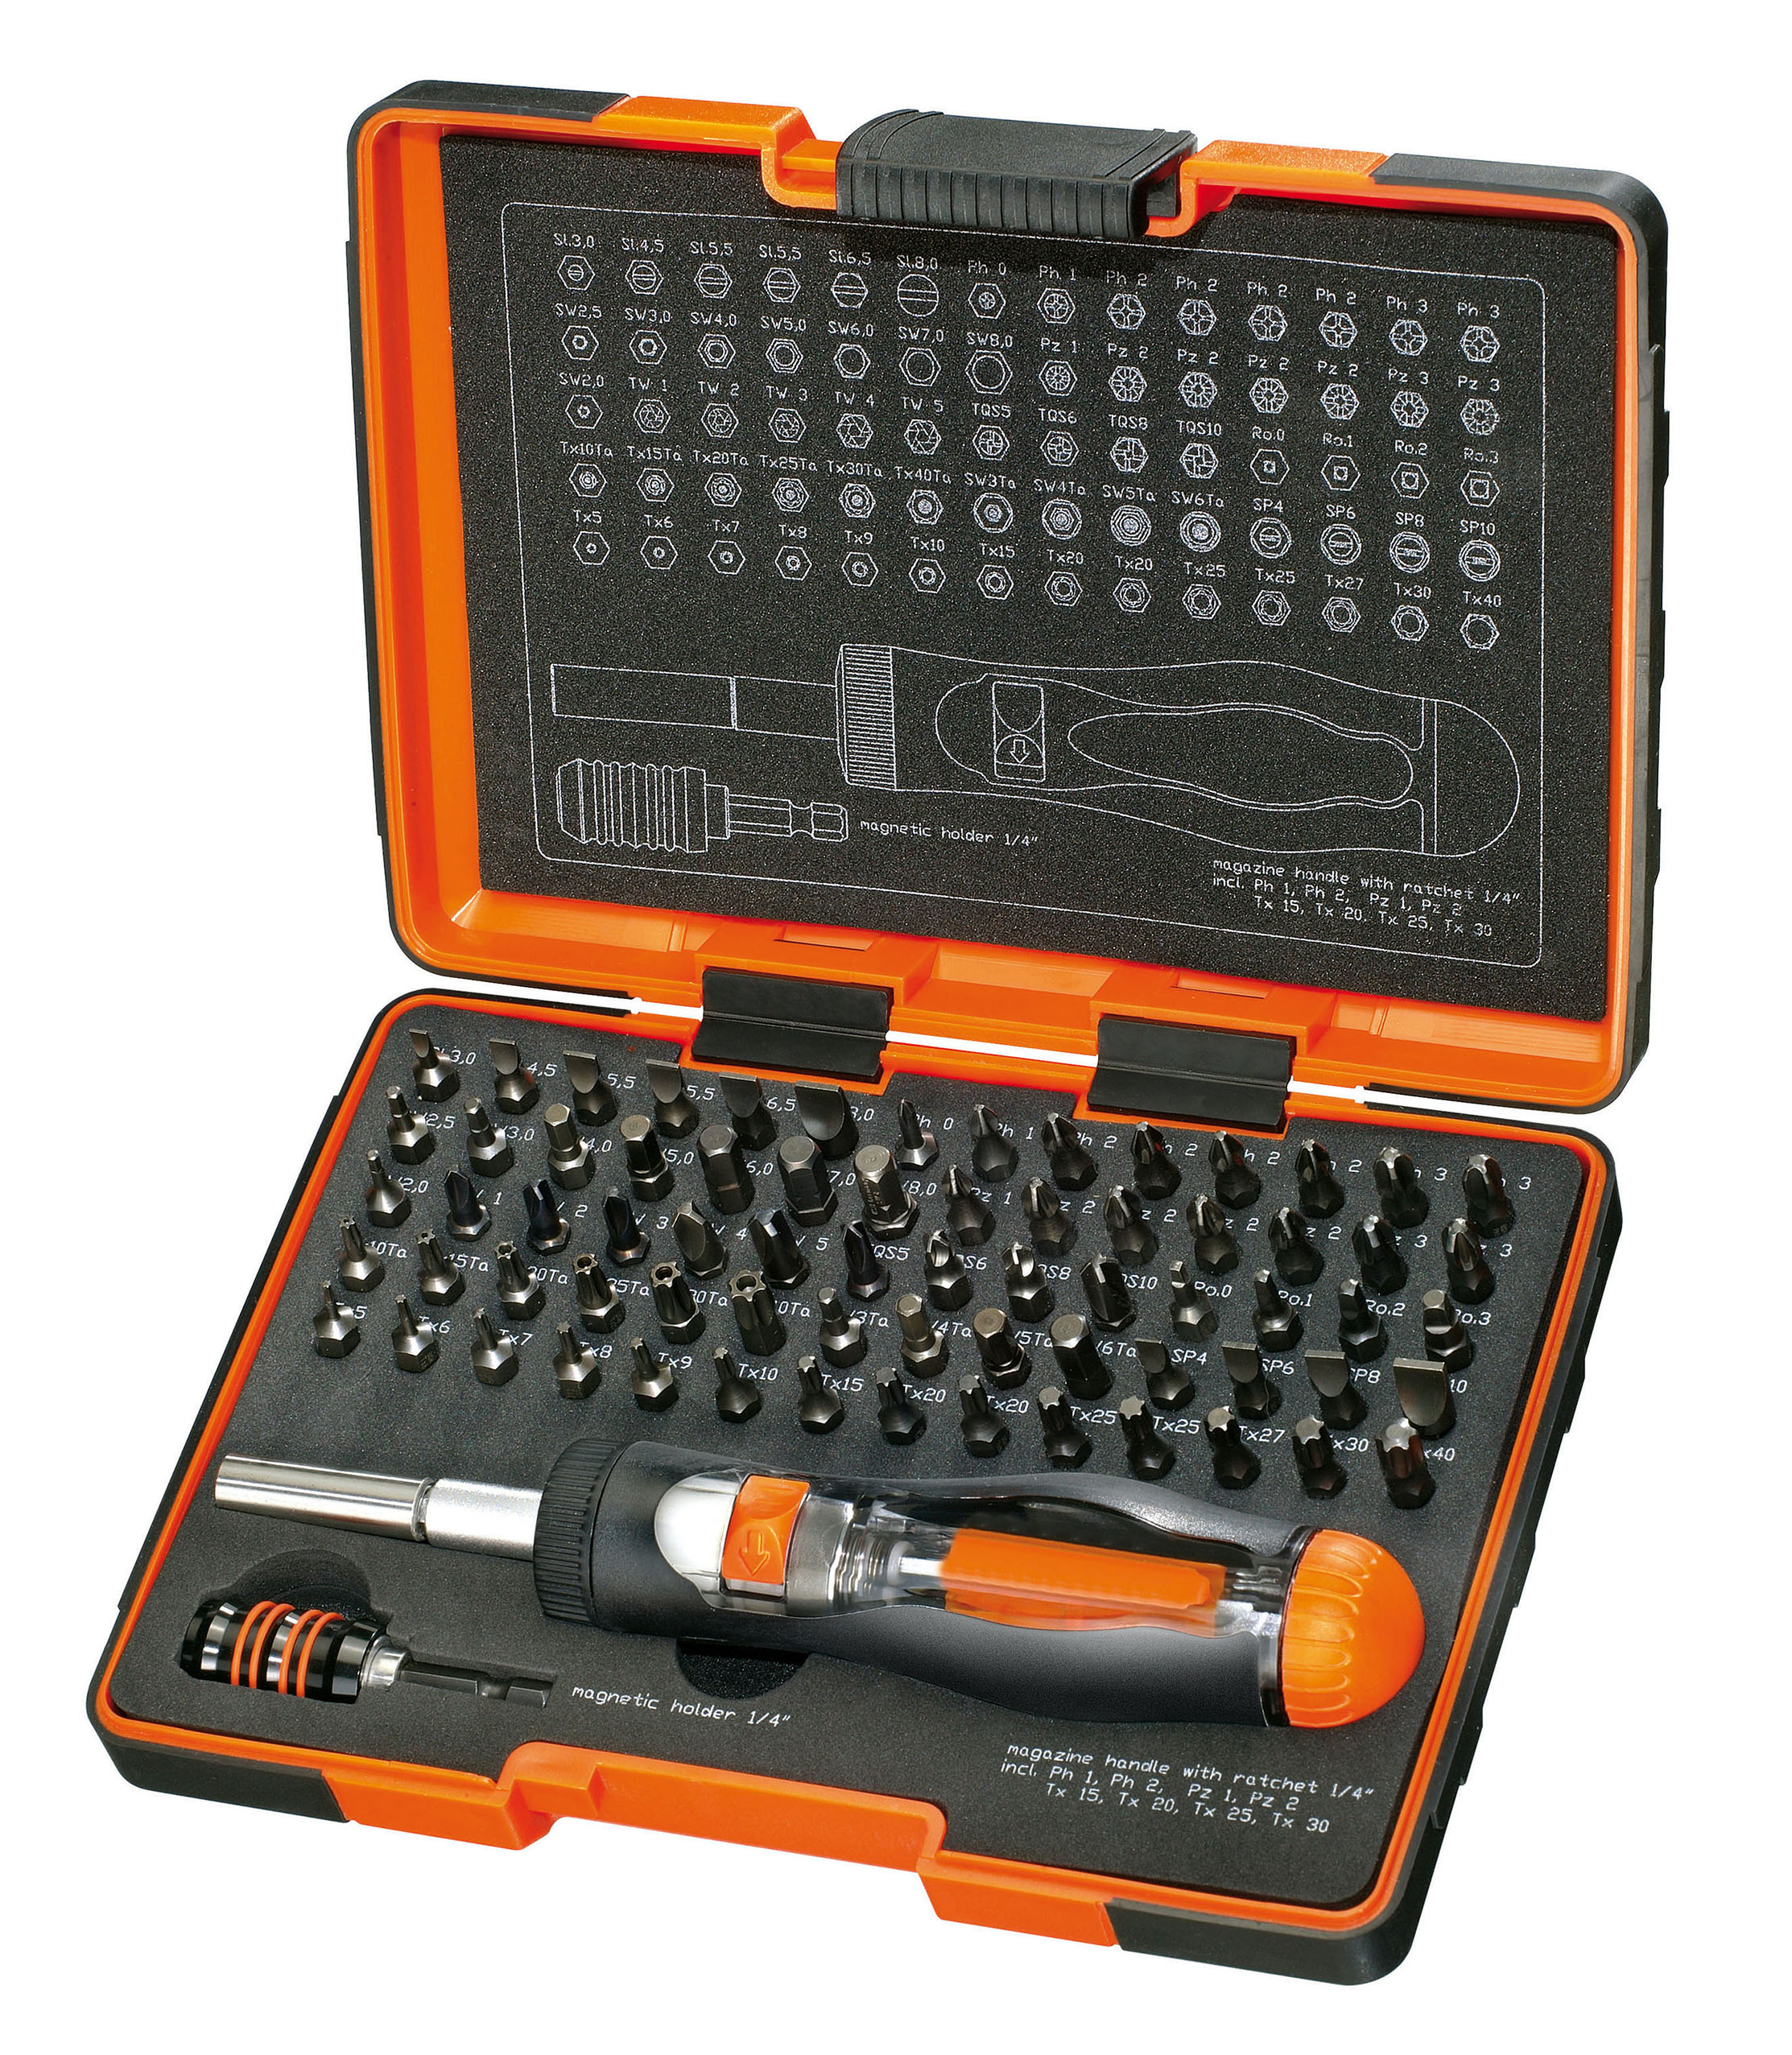 Screwdriving Torsion bit Set 12 torsion bits 25mm PZ1-2 (2)-3/PH1-2 (2)-3/ PL4,5-5,5-6,5 + bits holder - U643D.jpg